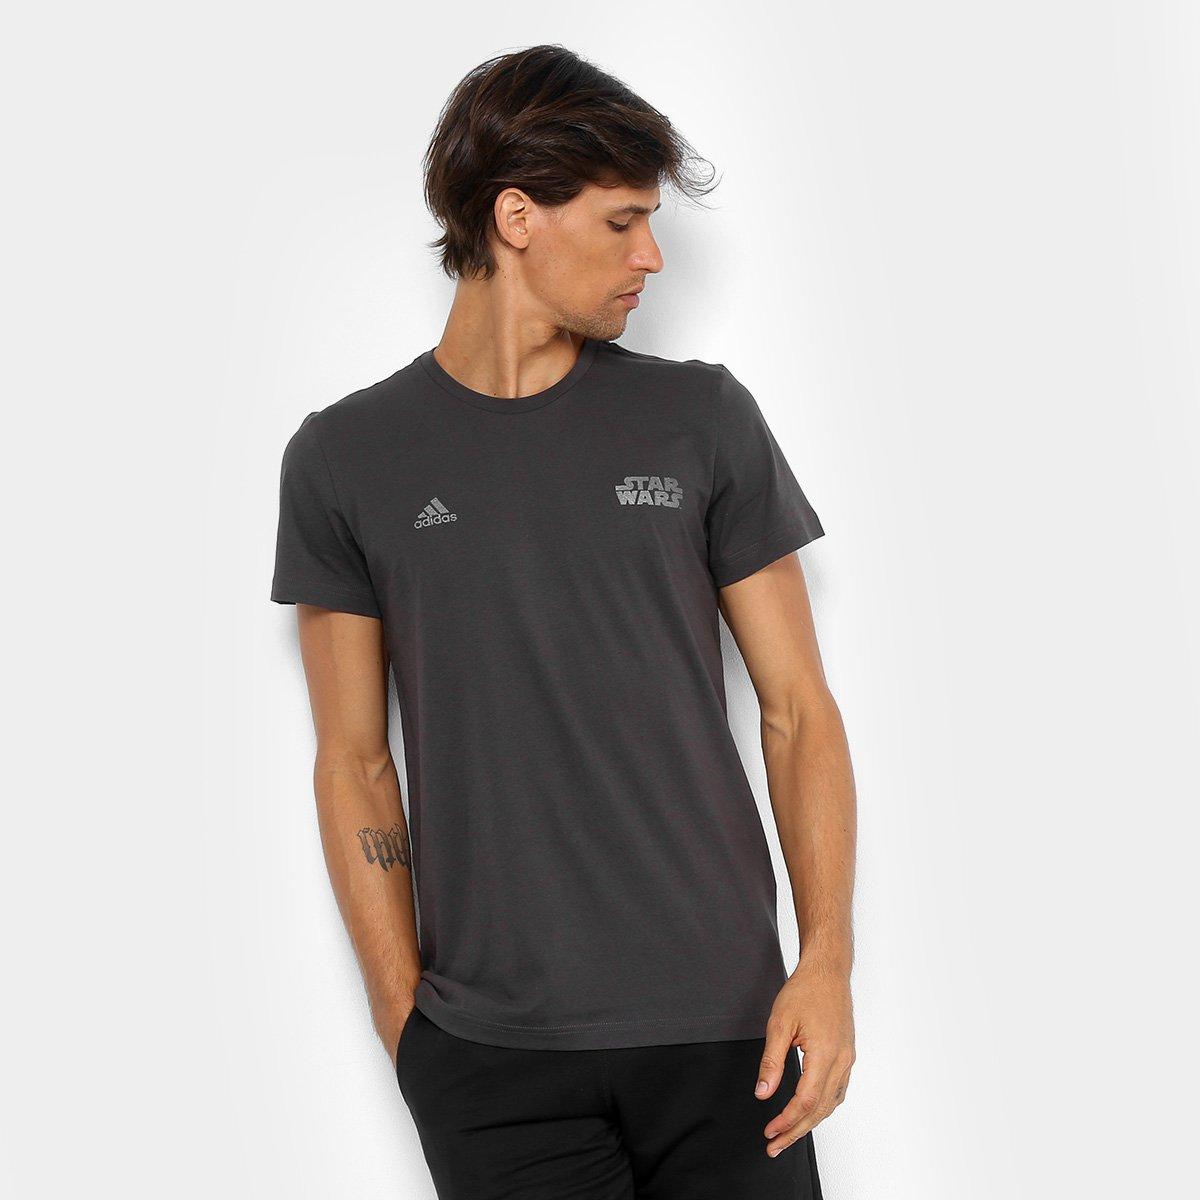 seno Leopardo liebre  Camiseta Adidas Star Wars Masculina | Netshoes